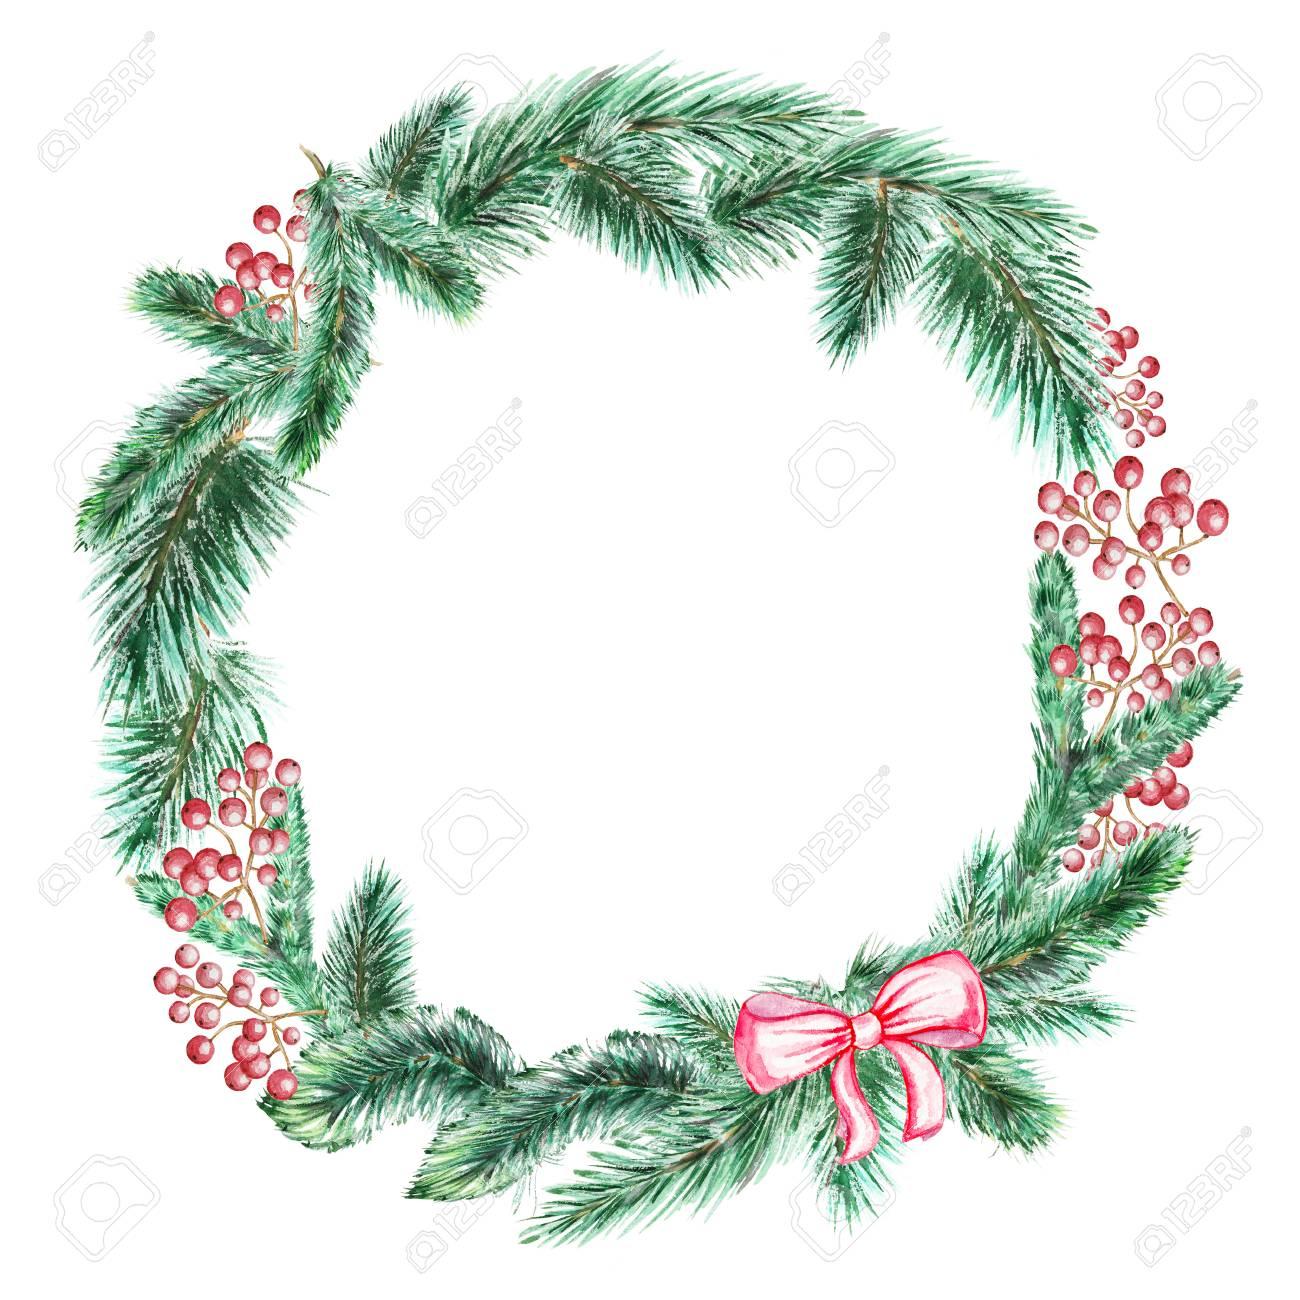 Christmas Wreath Drawing.Stock Illustration